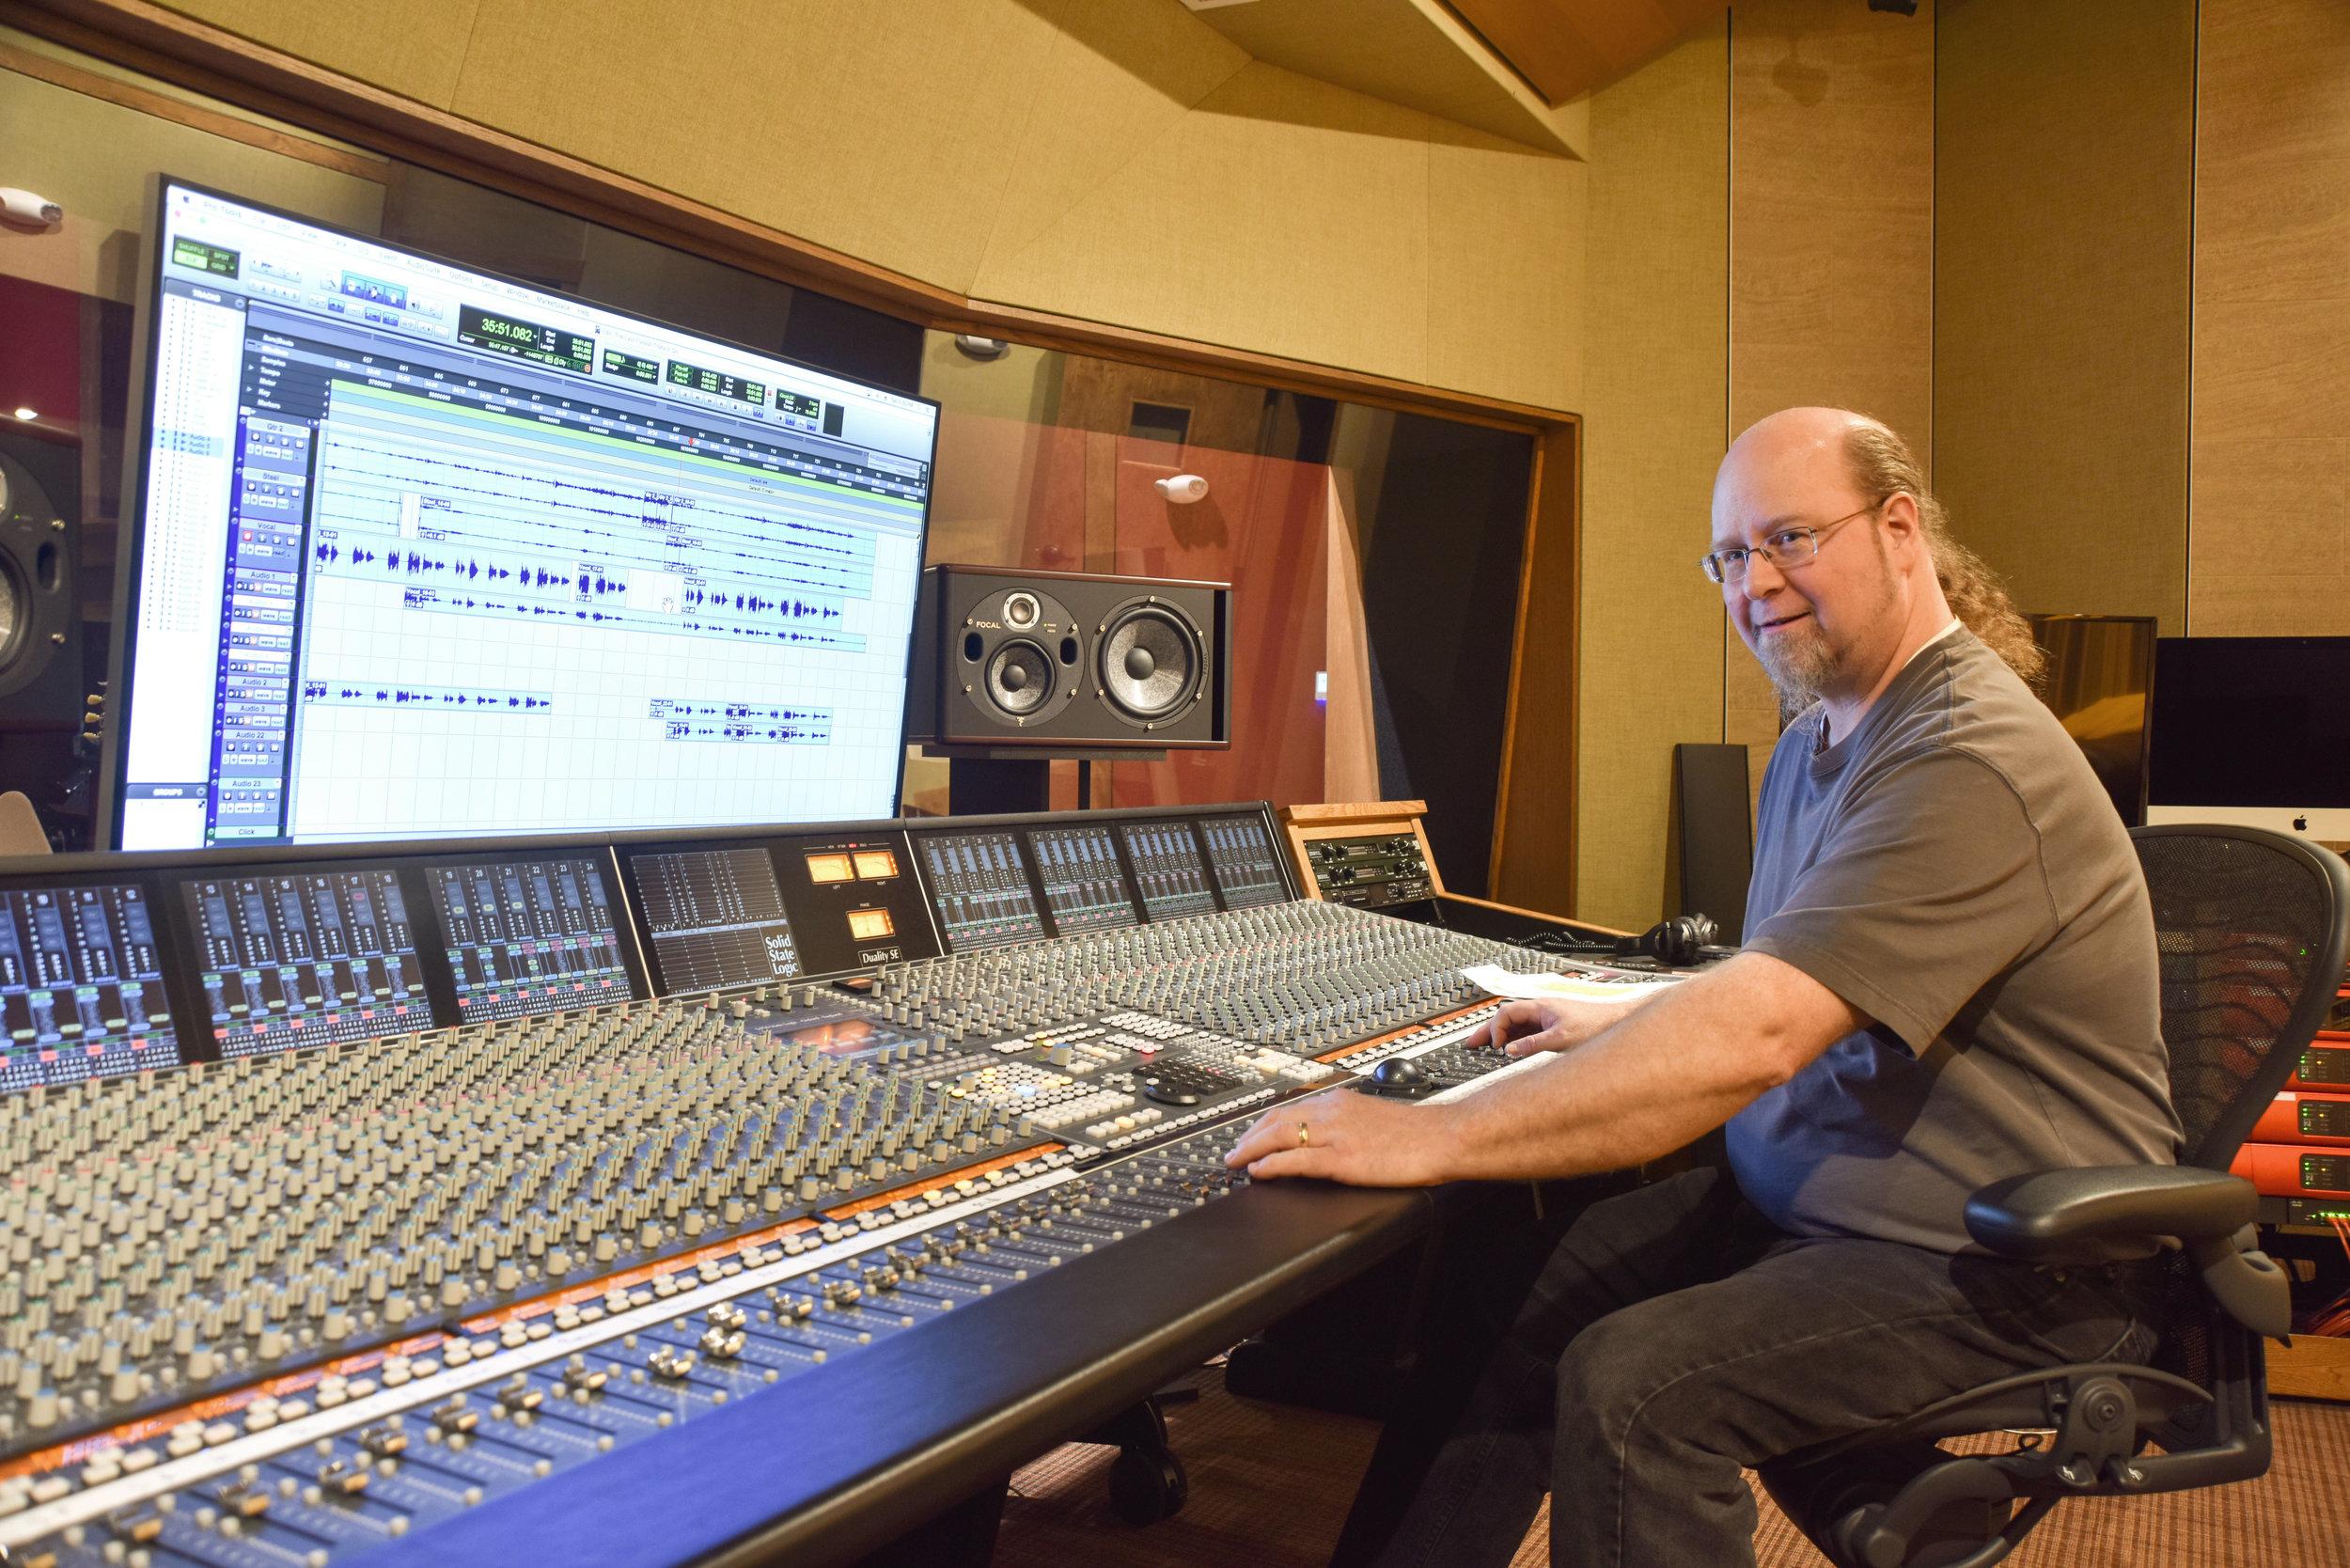 Dave Nachodsky - Production Manager